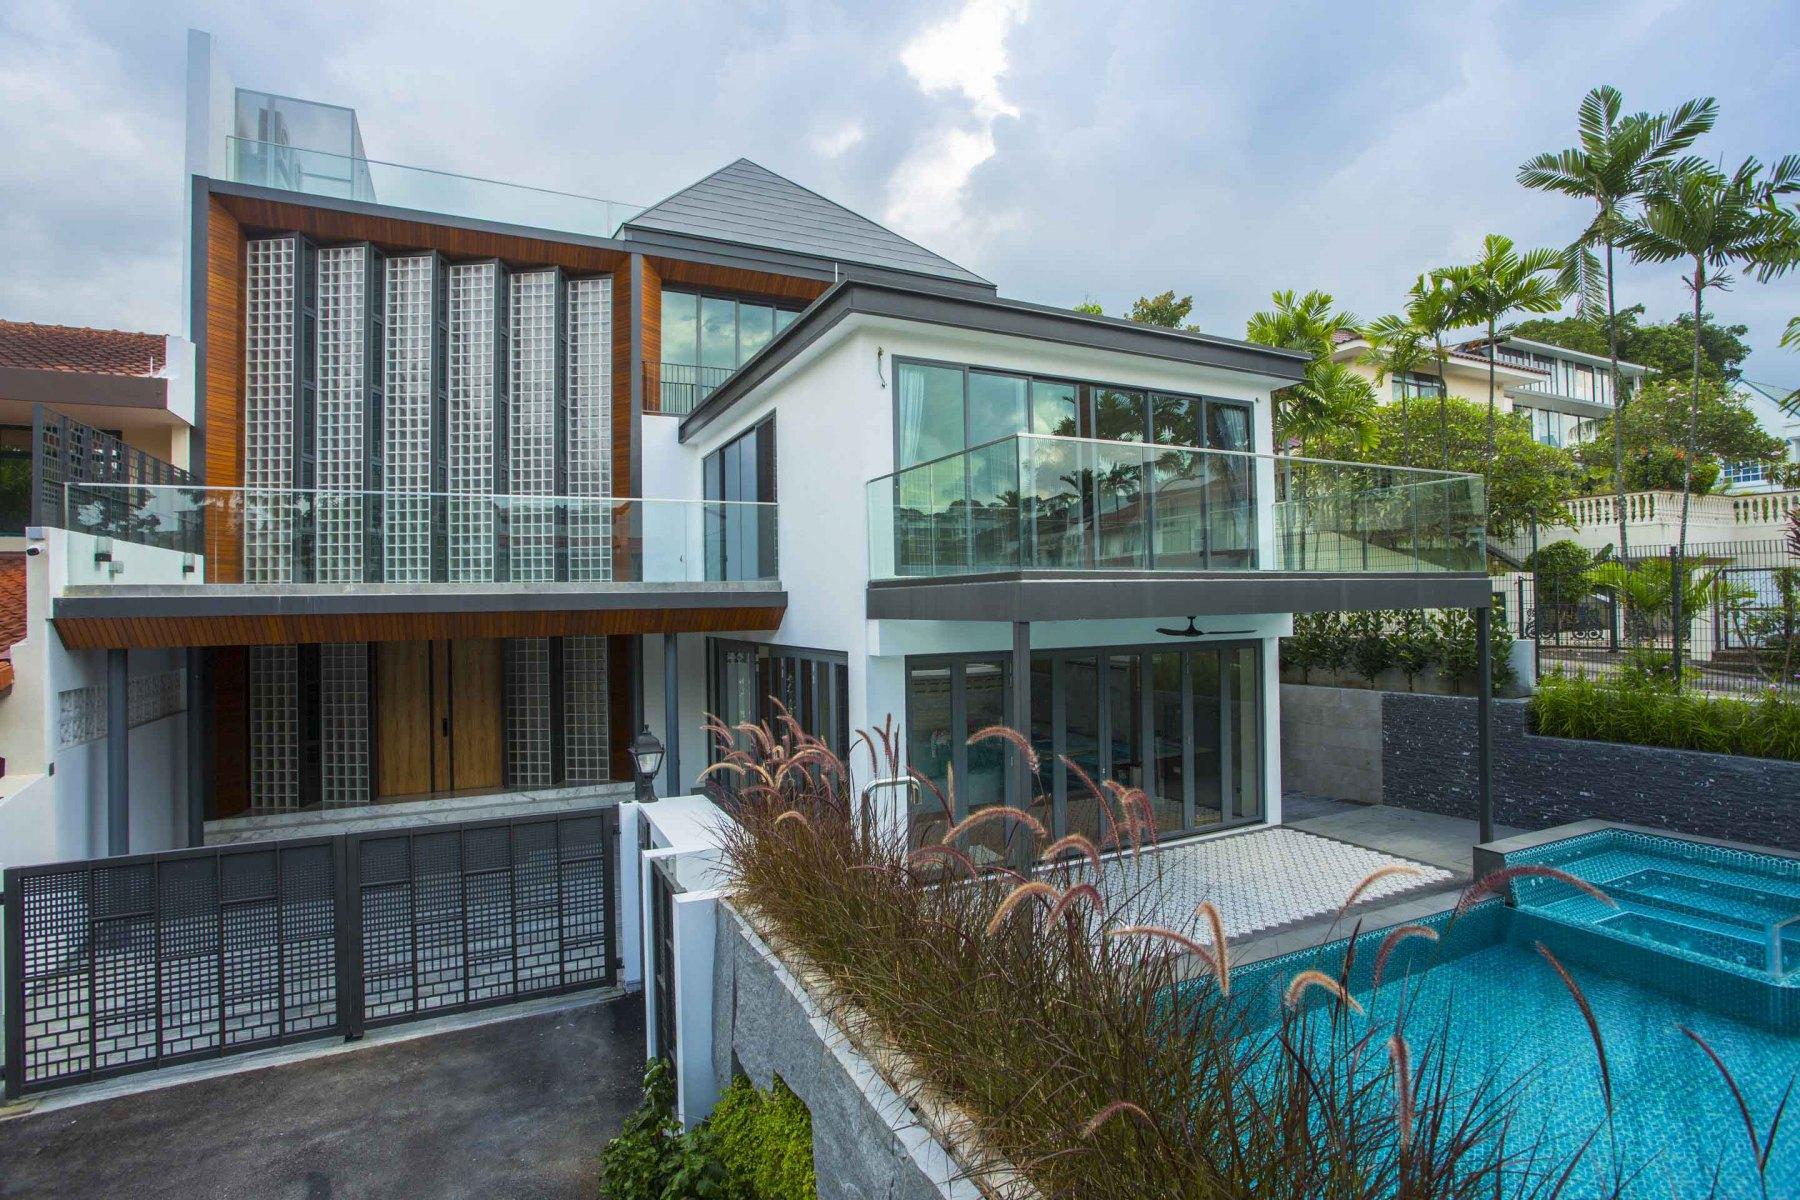 Interior-Photography-Singapore-Lifestyle-Construction-1